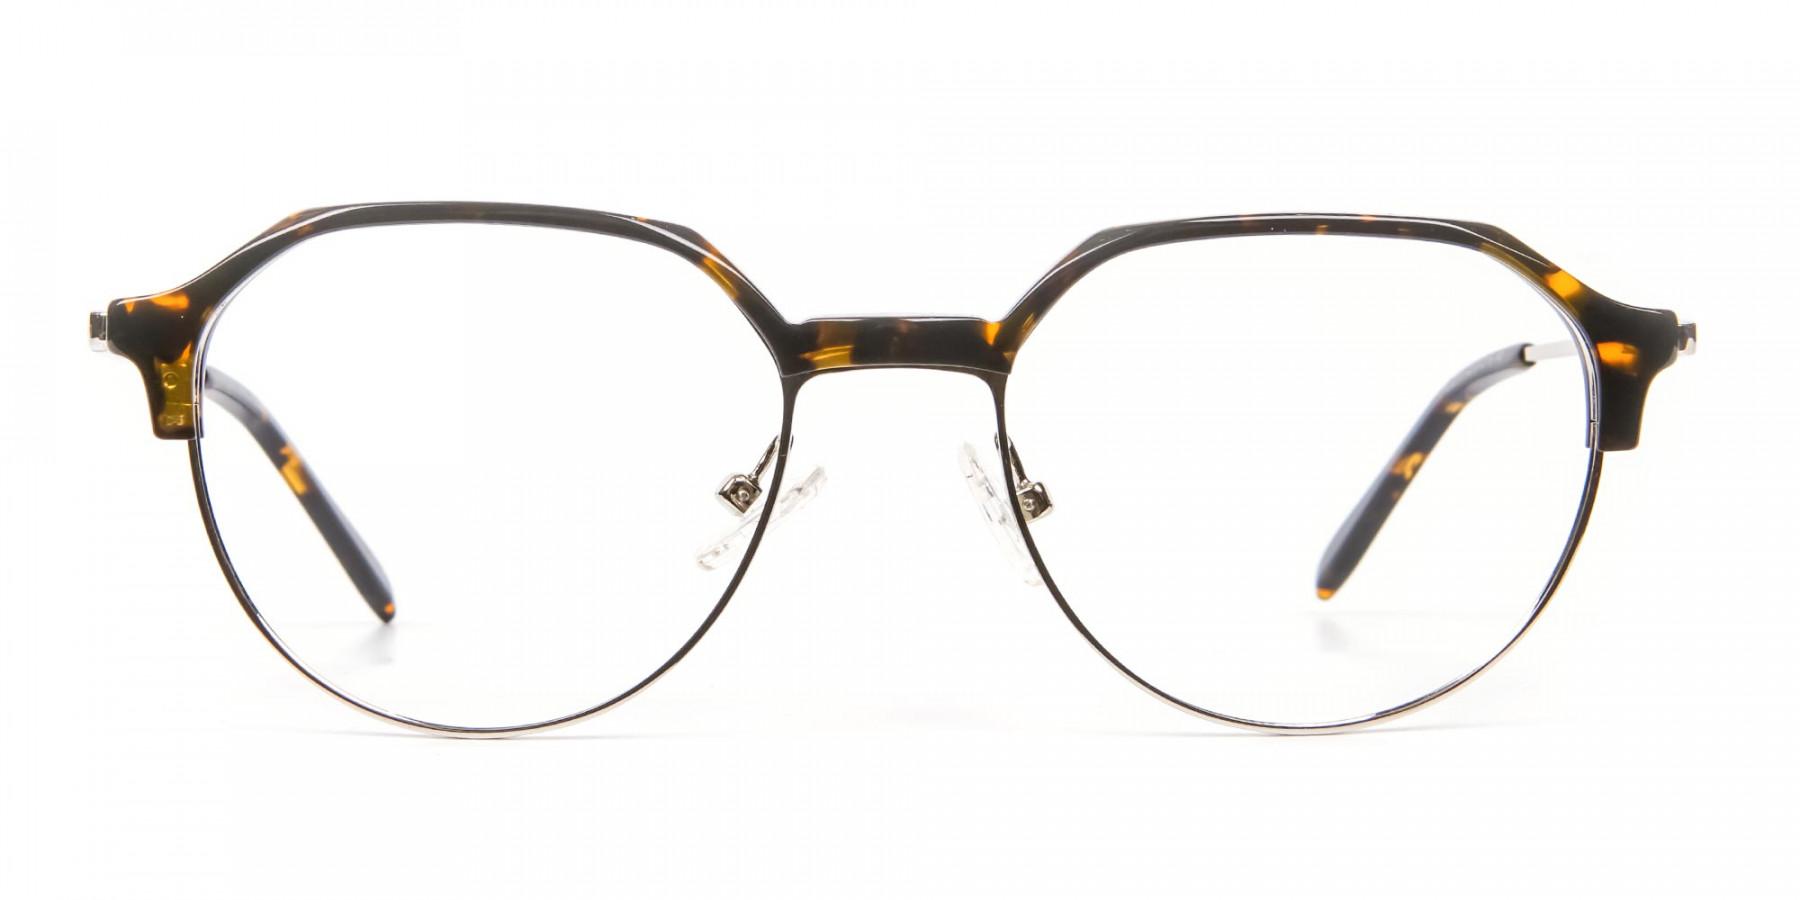 Havana & Tortoiseshell Browline Style Glasses - 1